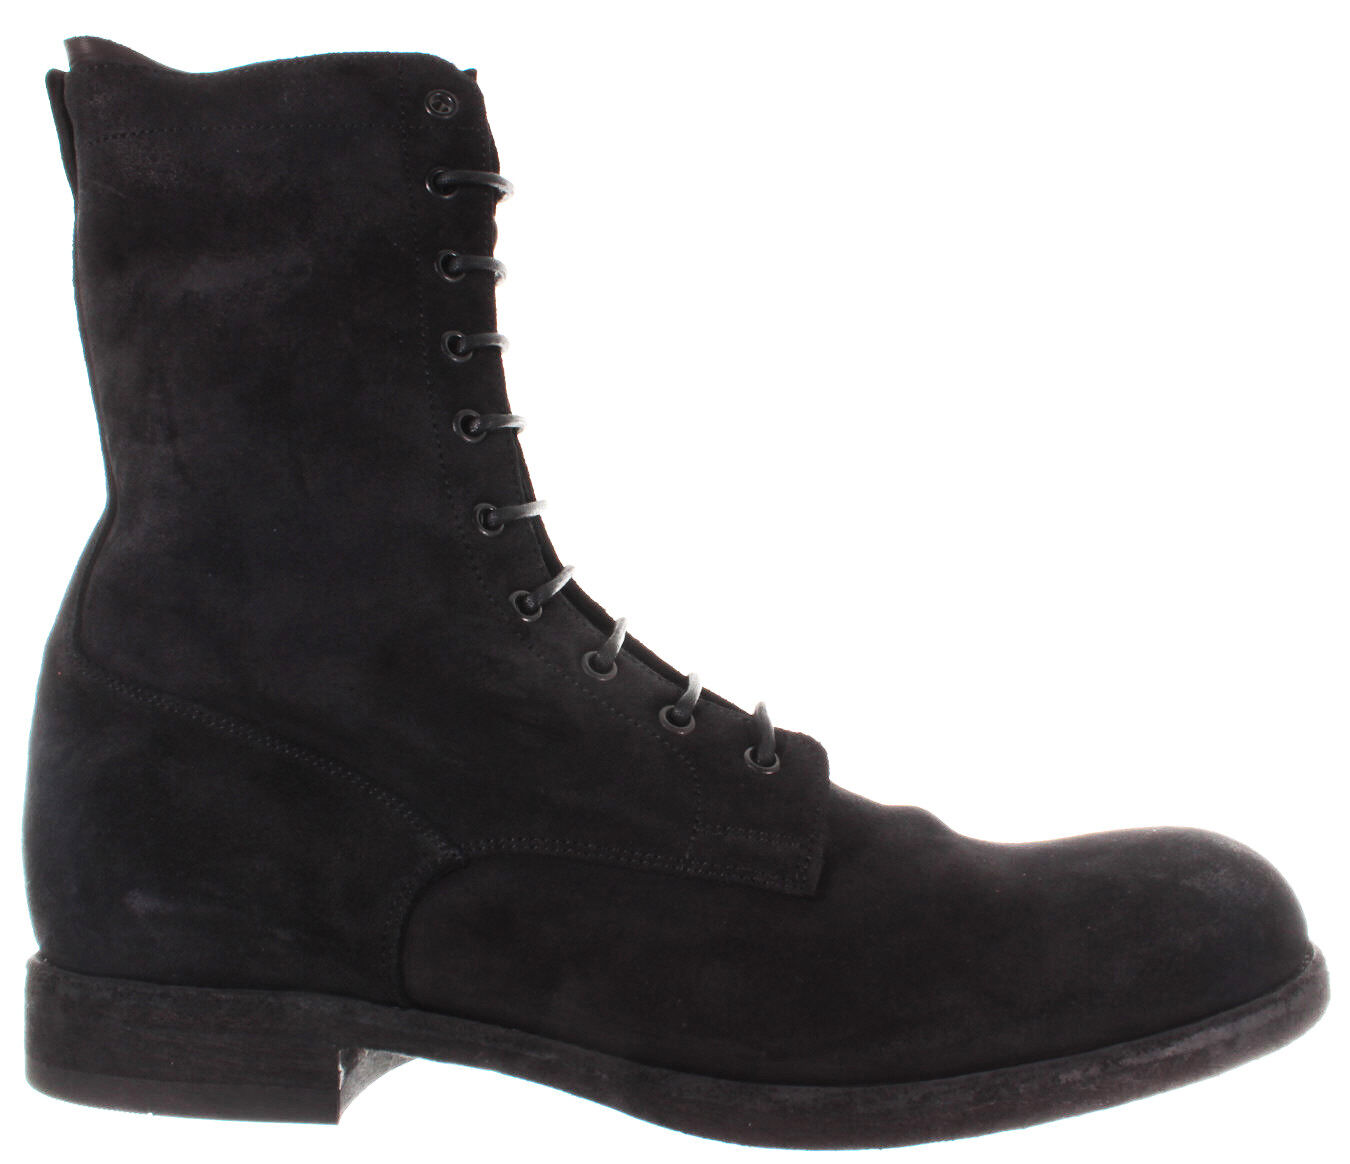 botas Zapatos para hombre PANTANETTI 12026 un Versus negro Raw Negro Adam 920 Gamuza Italia